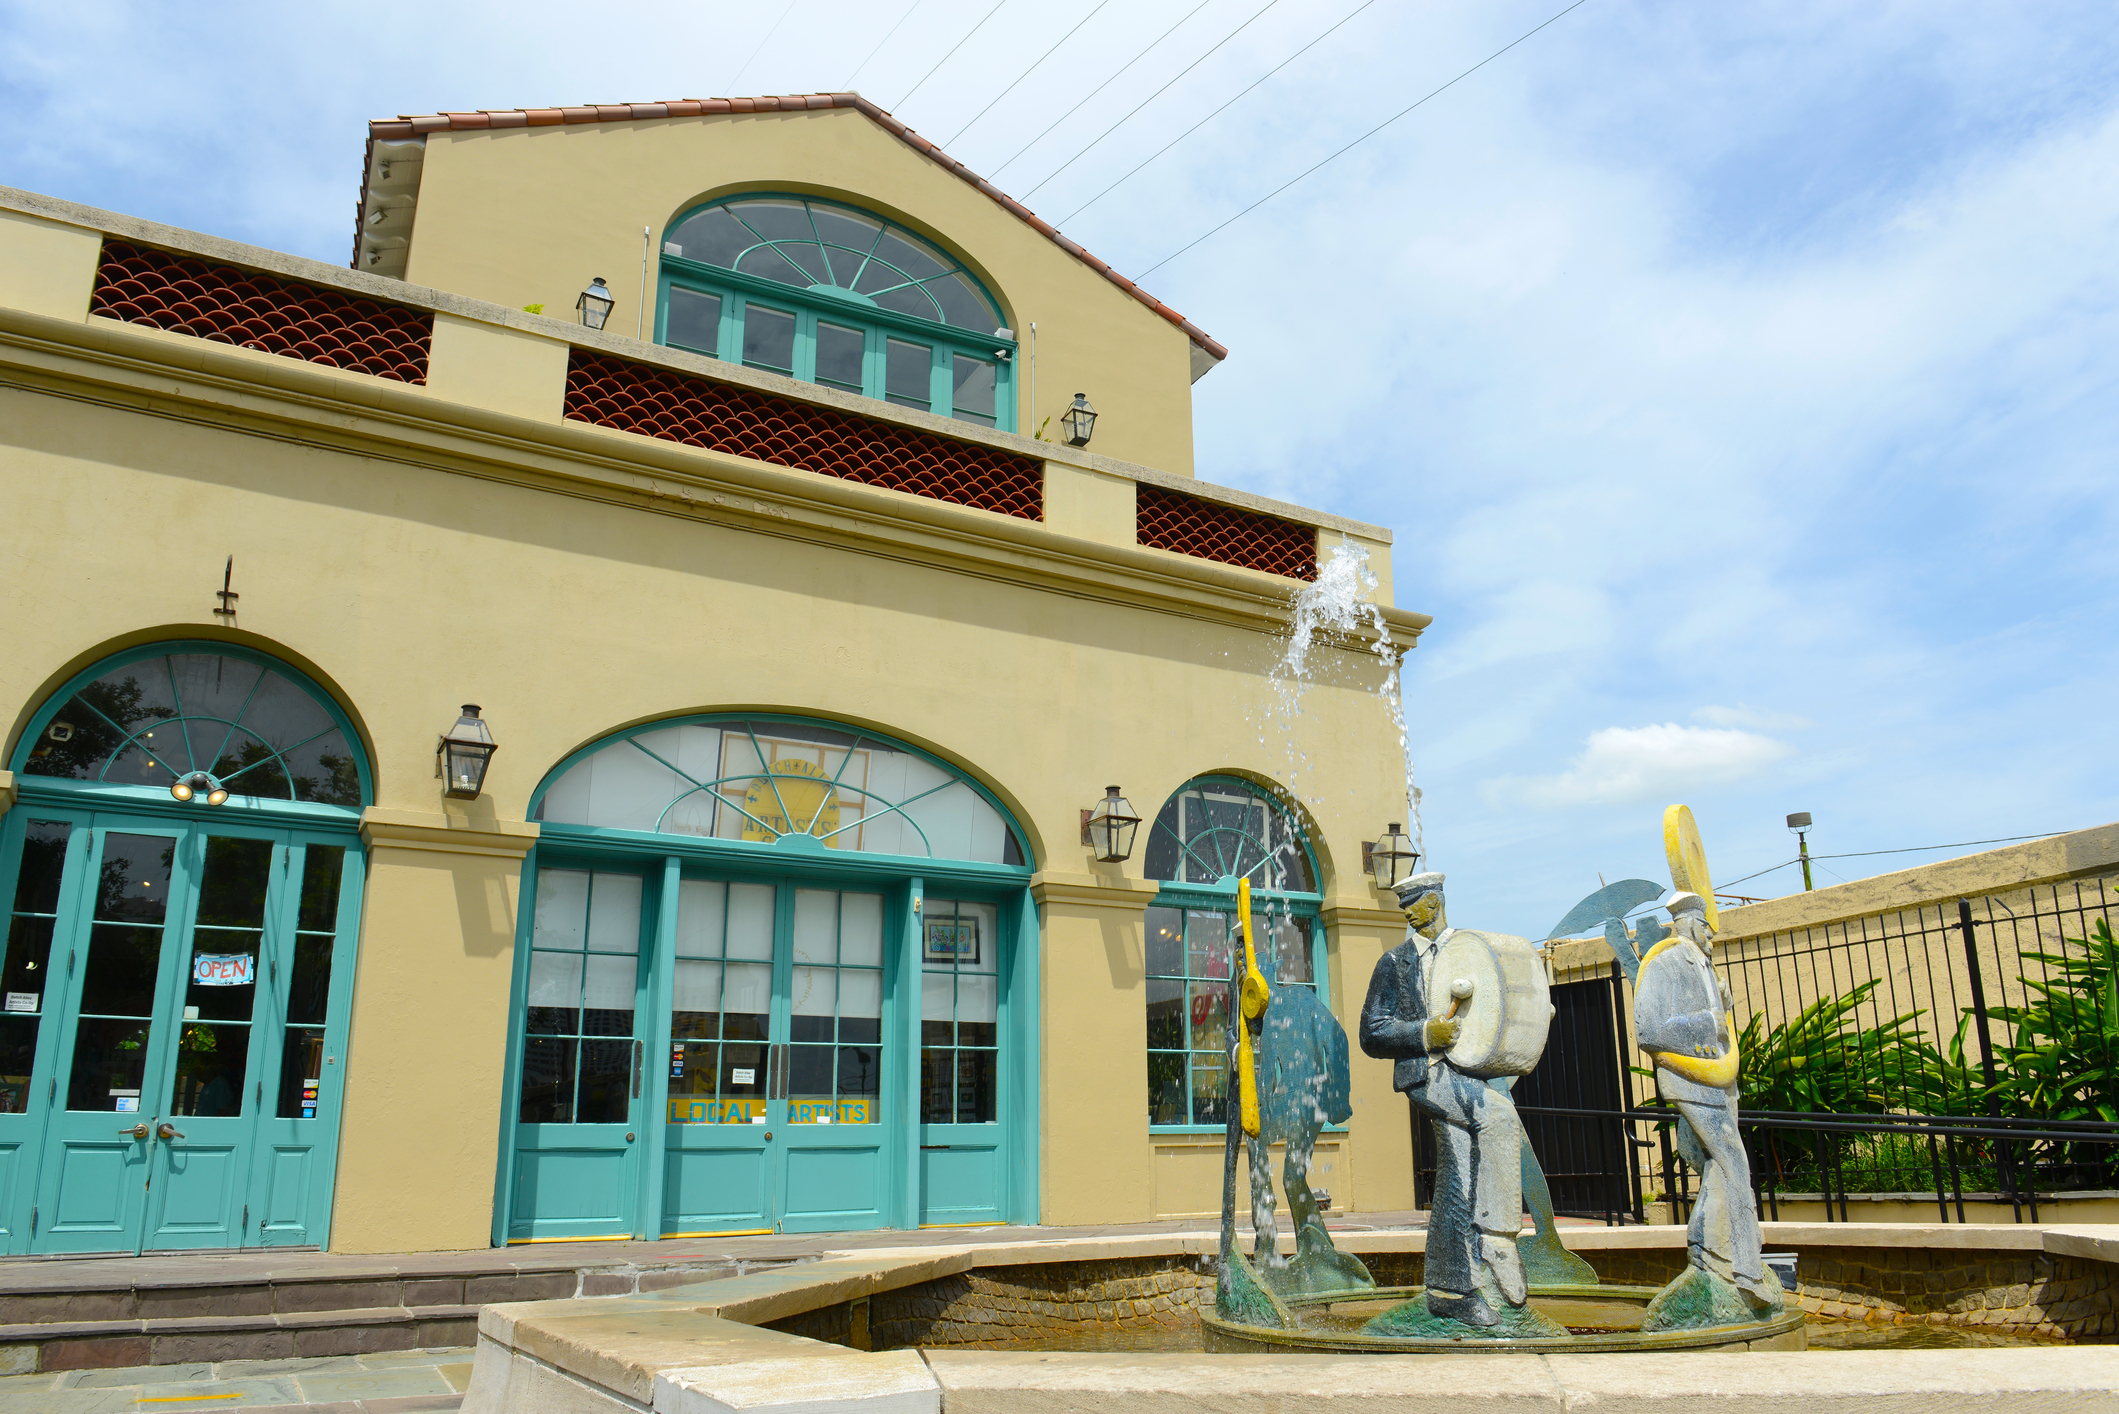 New-Orleans-Jazz-National-Historical-Park.jpg?mtime=20190405091625#asset:105424